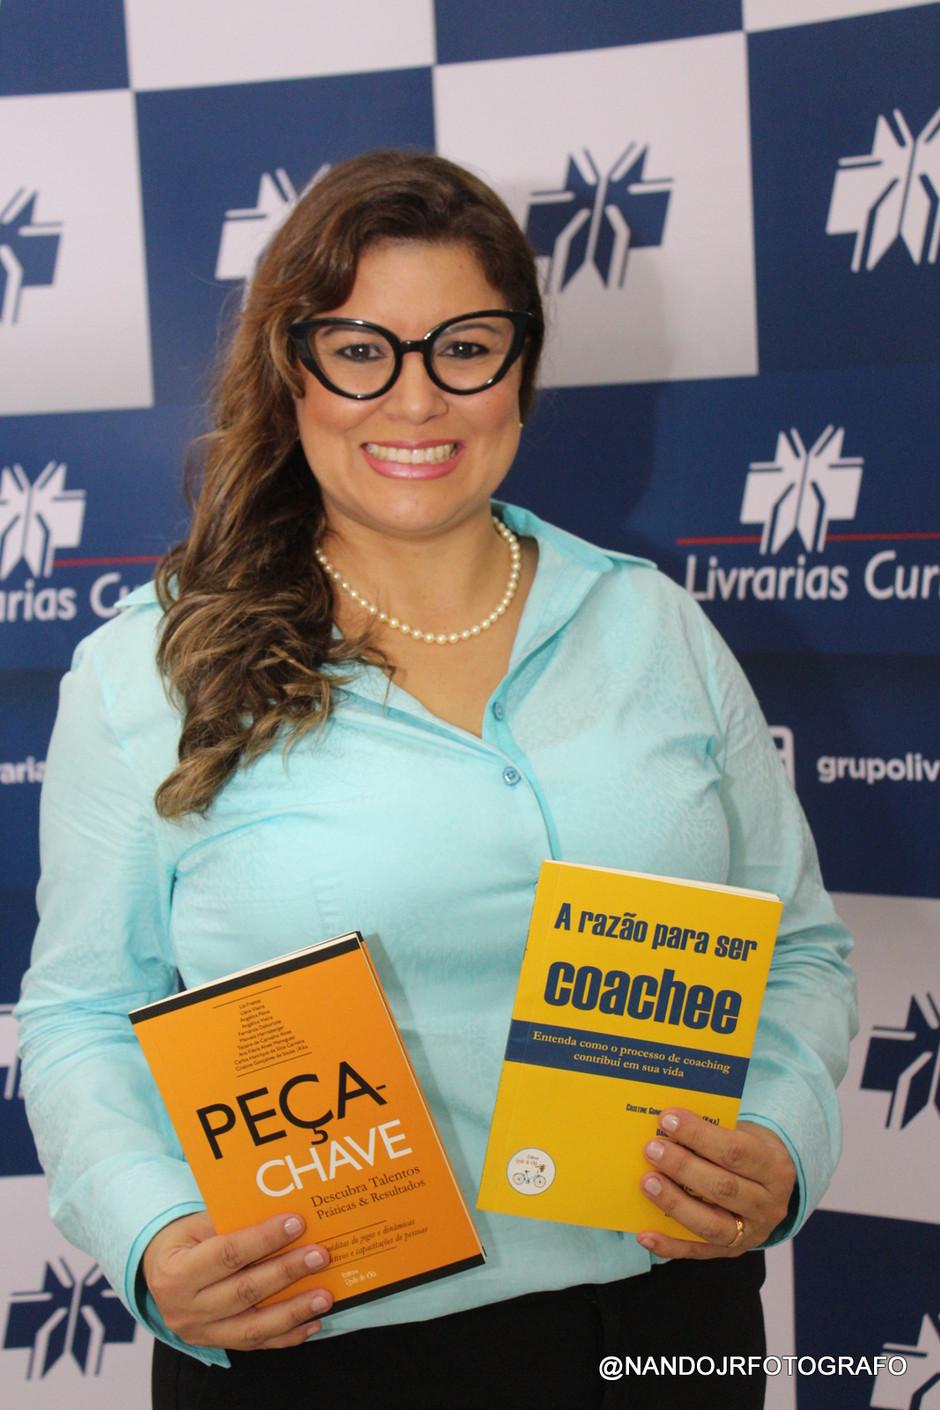 Boa colheita: livros da Editora Roda da Kika percorrendo o Brasil